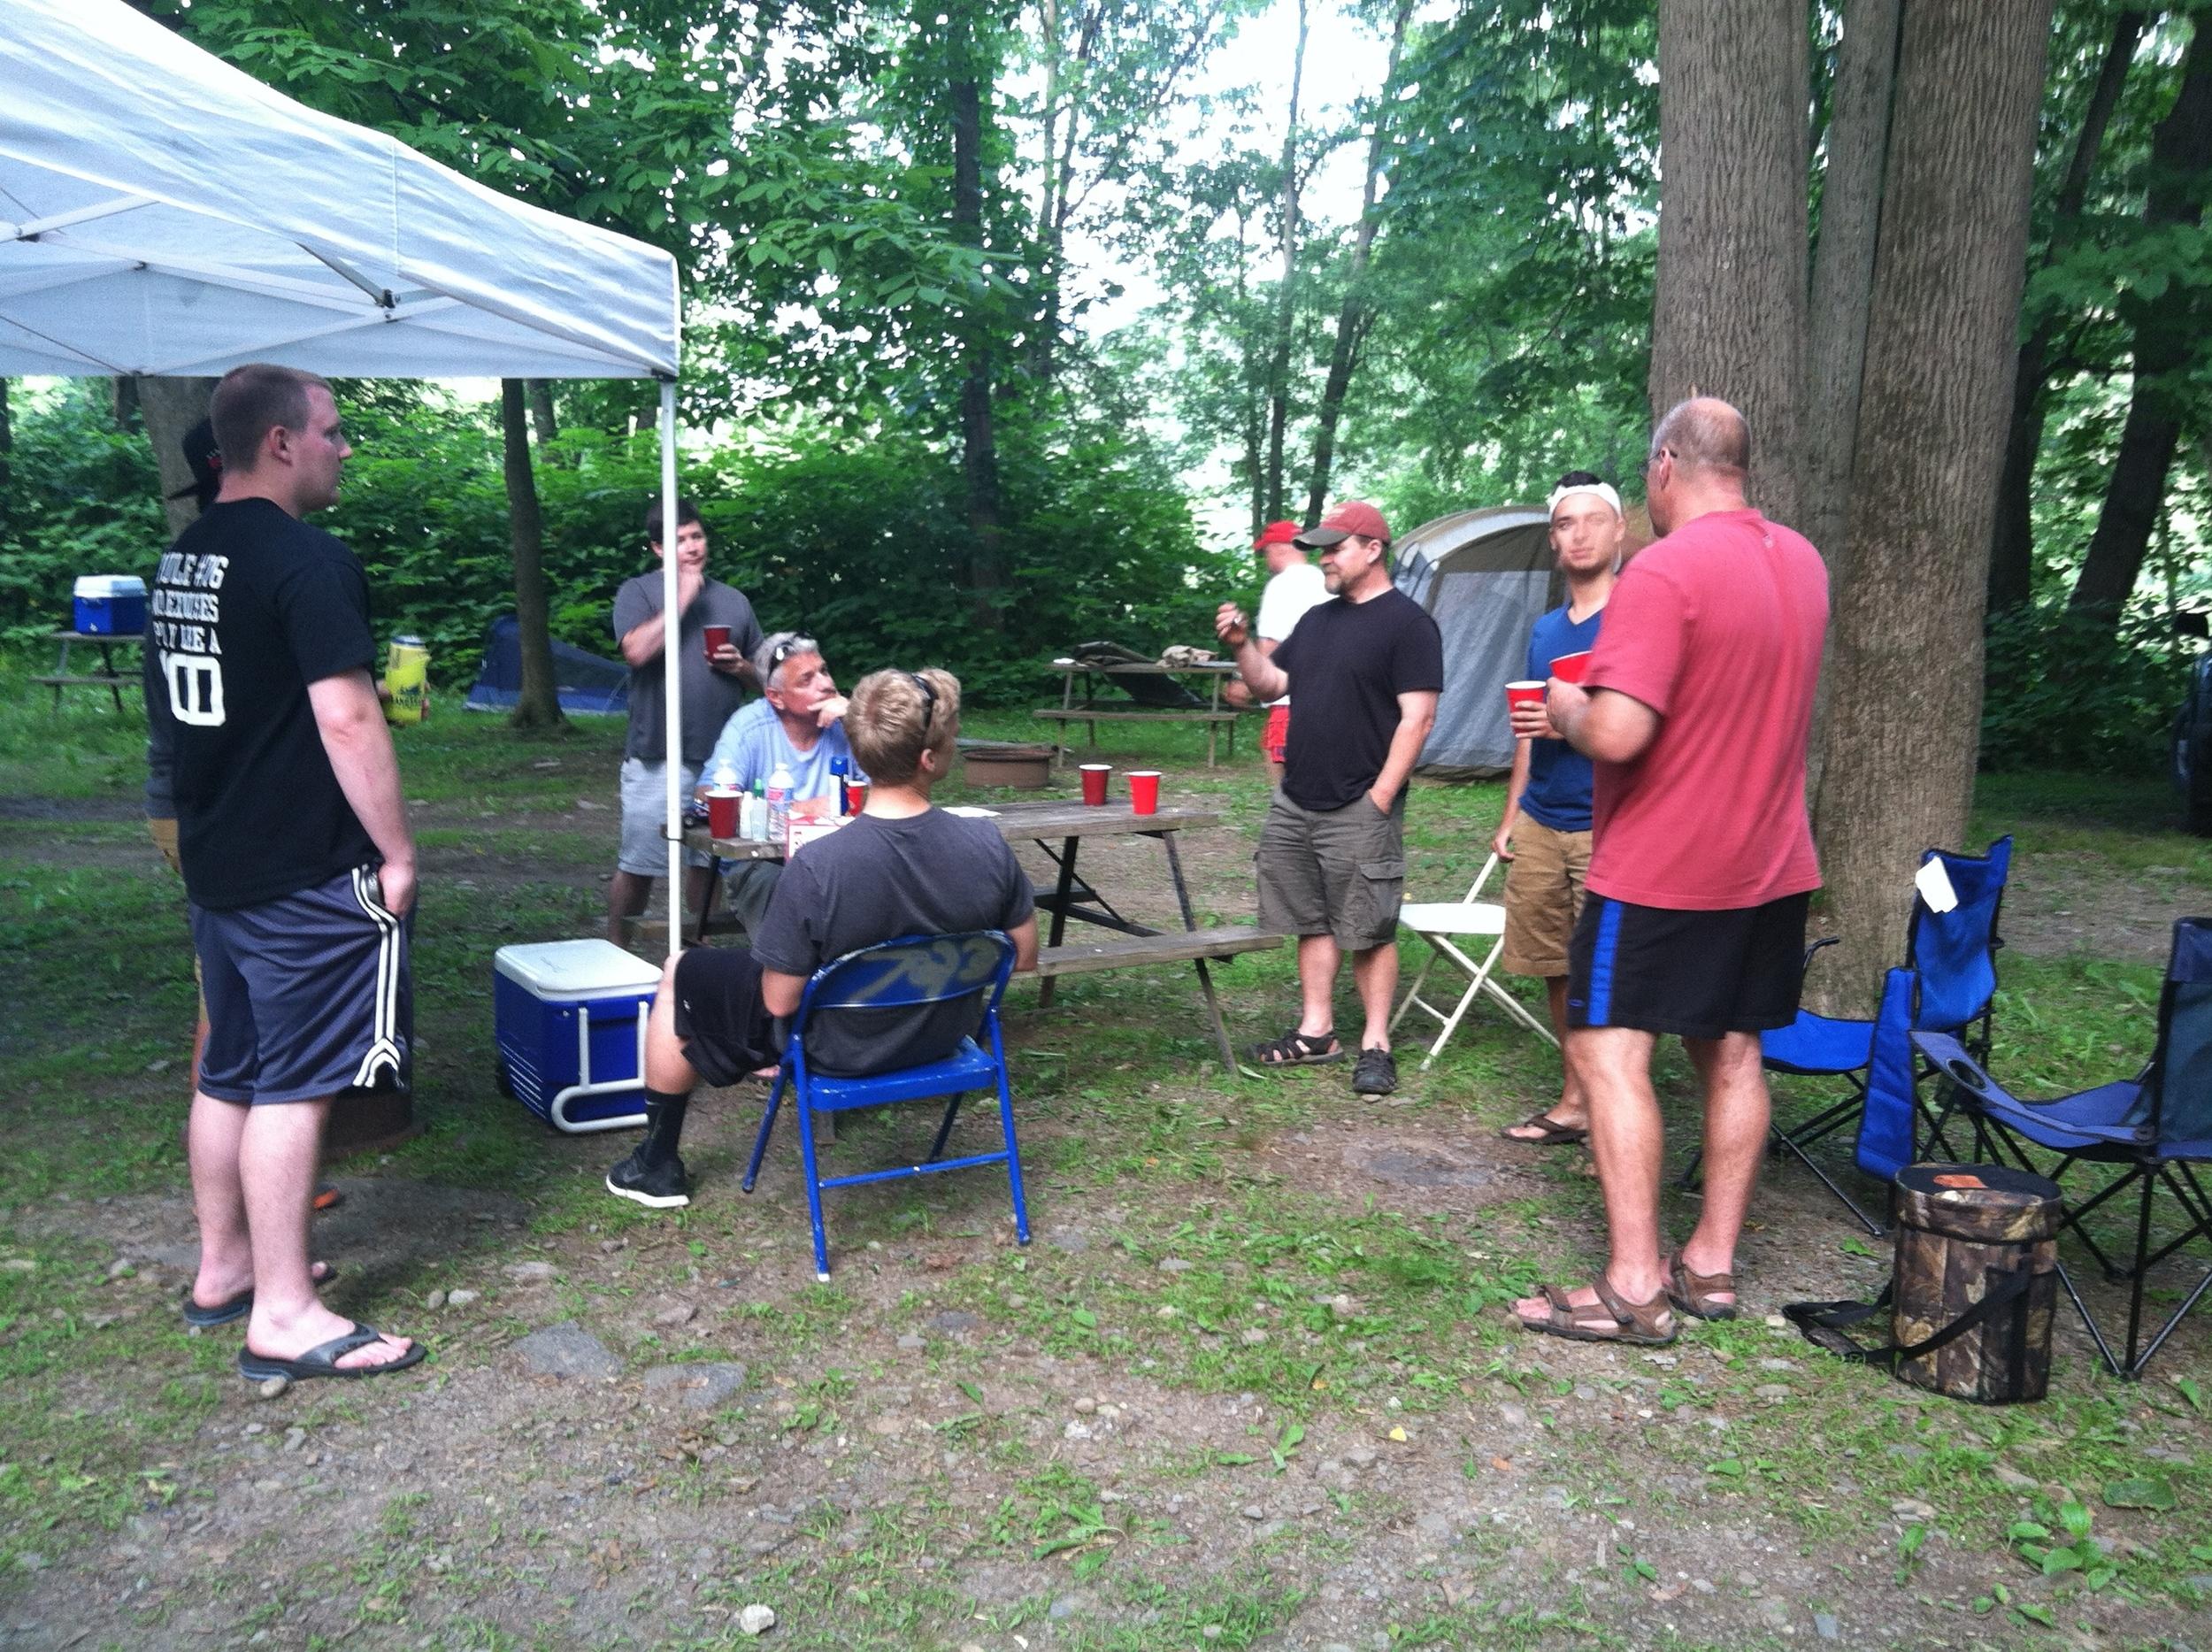 2014 - Saturday night camp